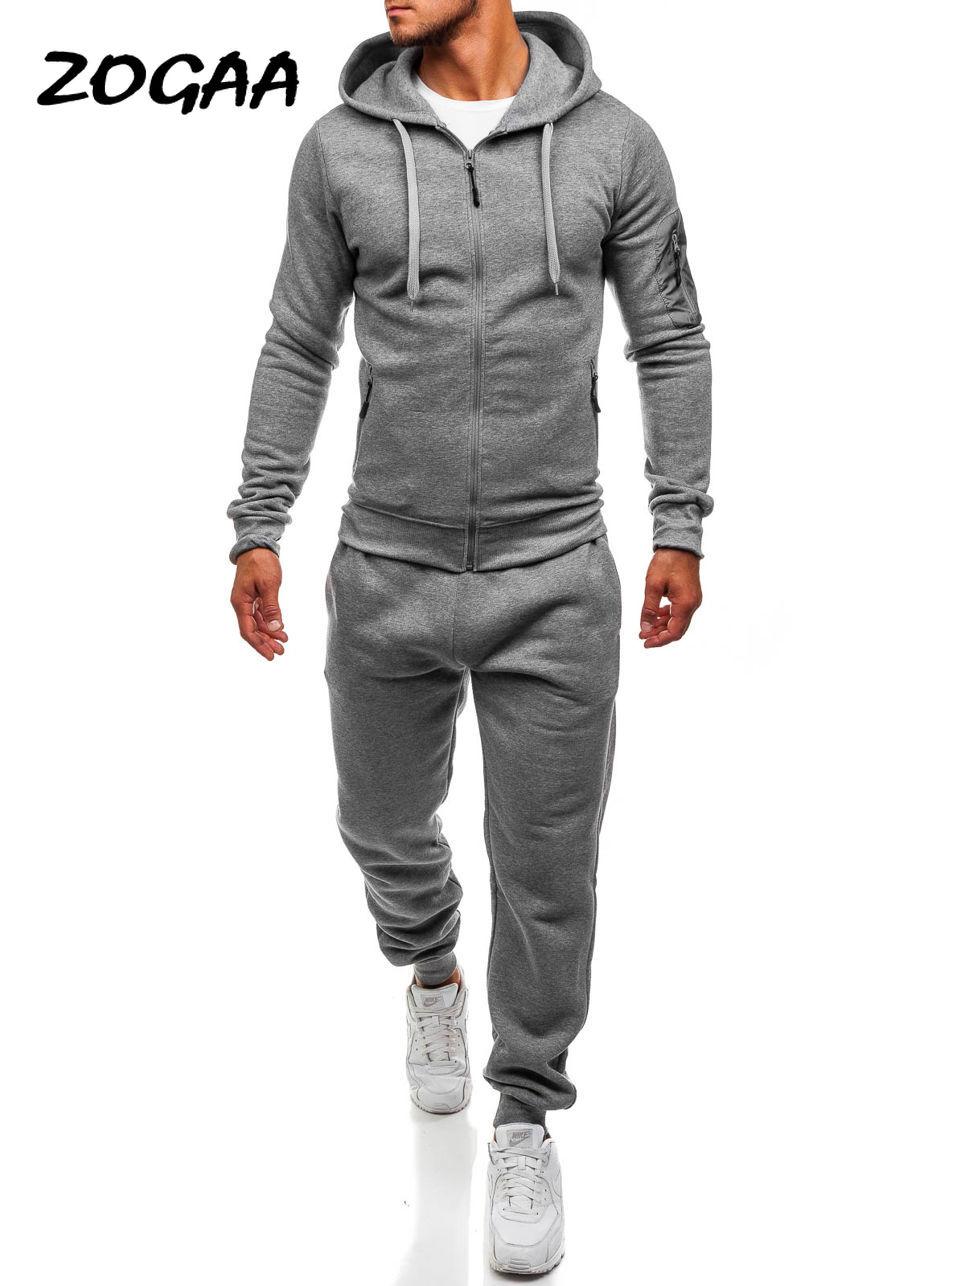 ZOGAA 2020 Spring Hot Sale Men's Sports And Leisure Slim Joggers SweatSuits Hoodies+Pants Suit CSweatshirt Sportswear Set 2pc